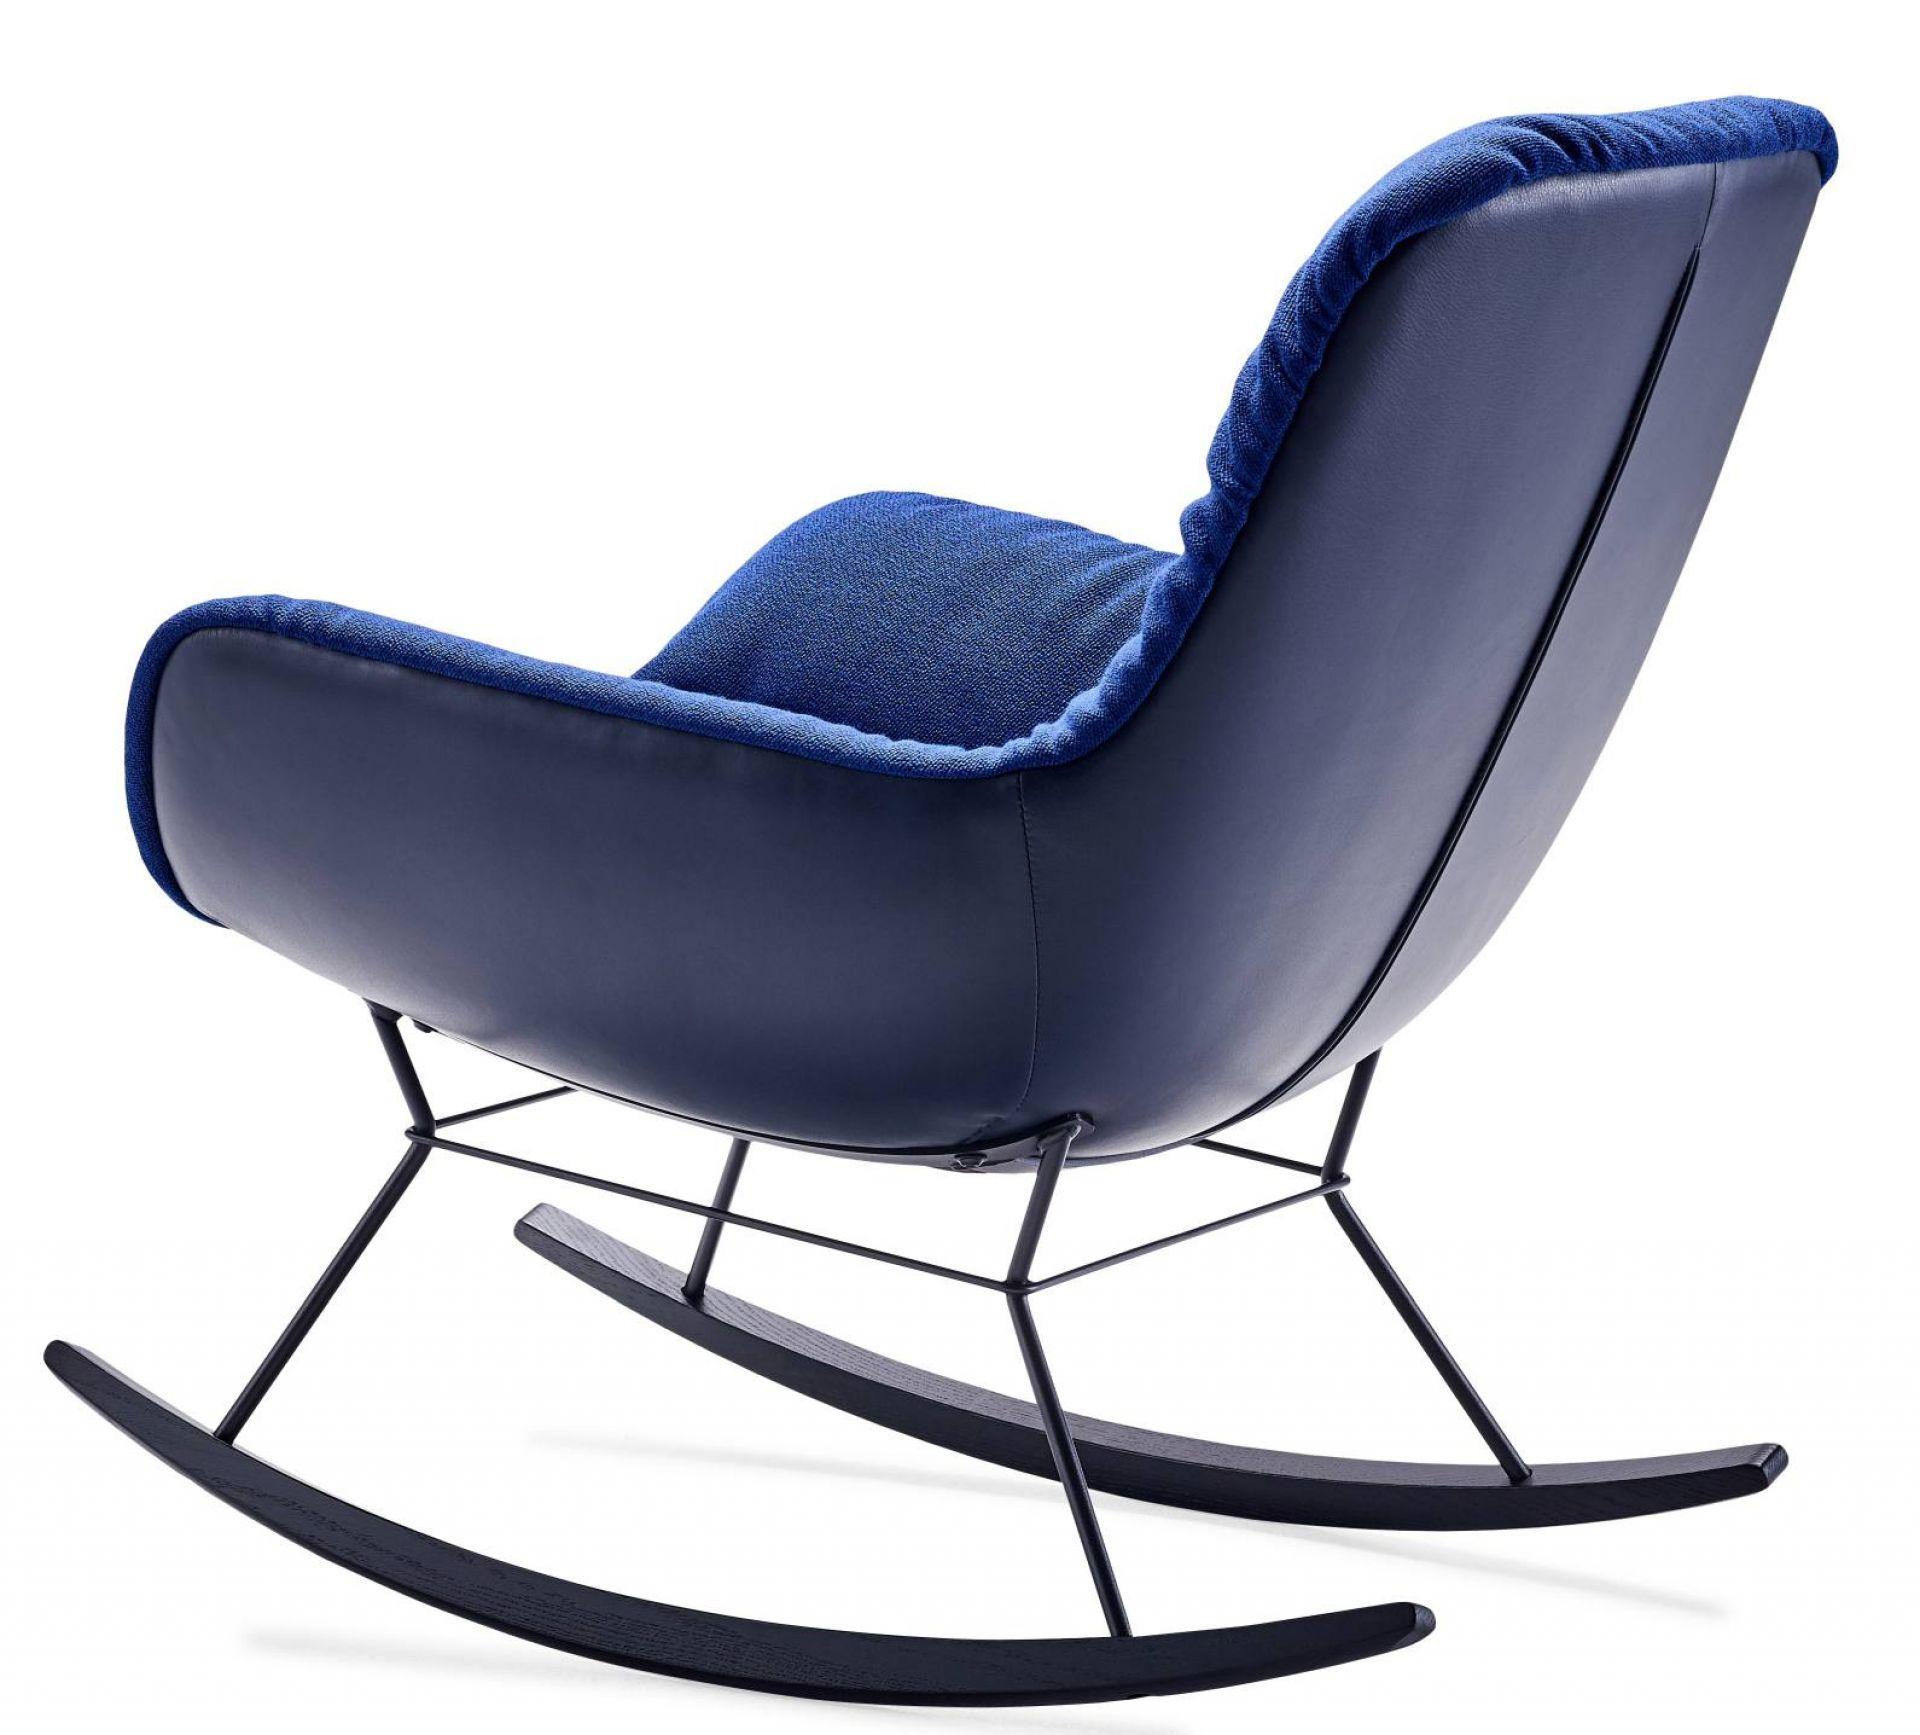 Leya Rocking Lounge Chair Schaukelsessel Freifrau Sitzmöbelmanufaktur